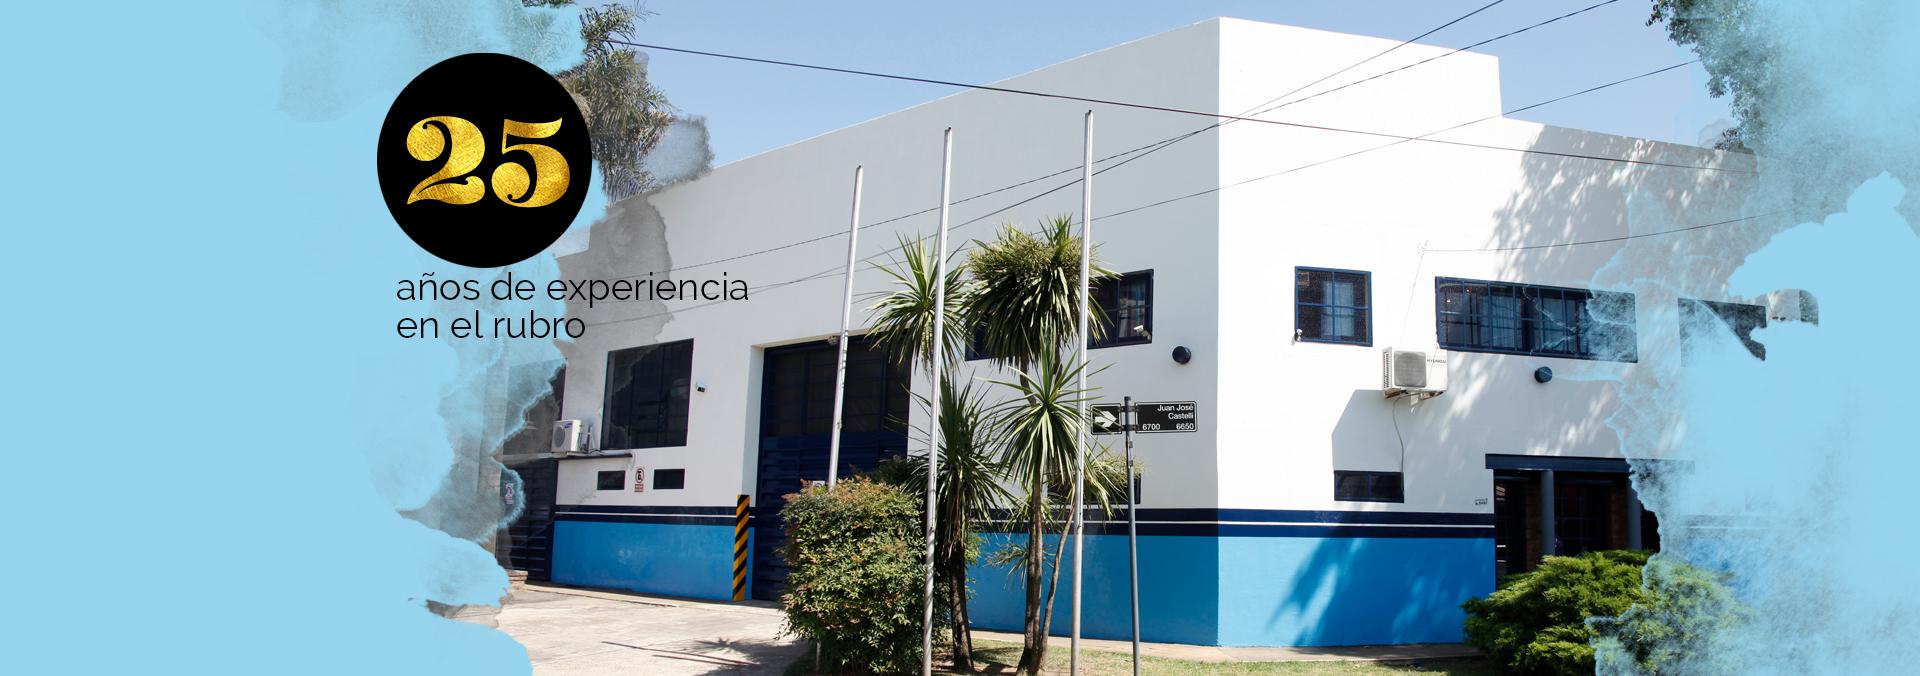 Fábrica Plasticos JM srl